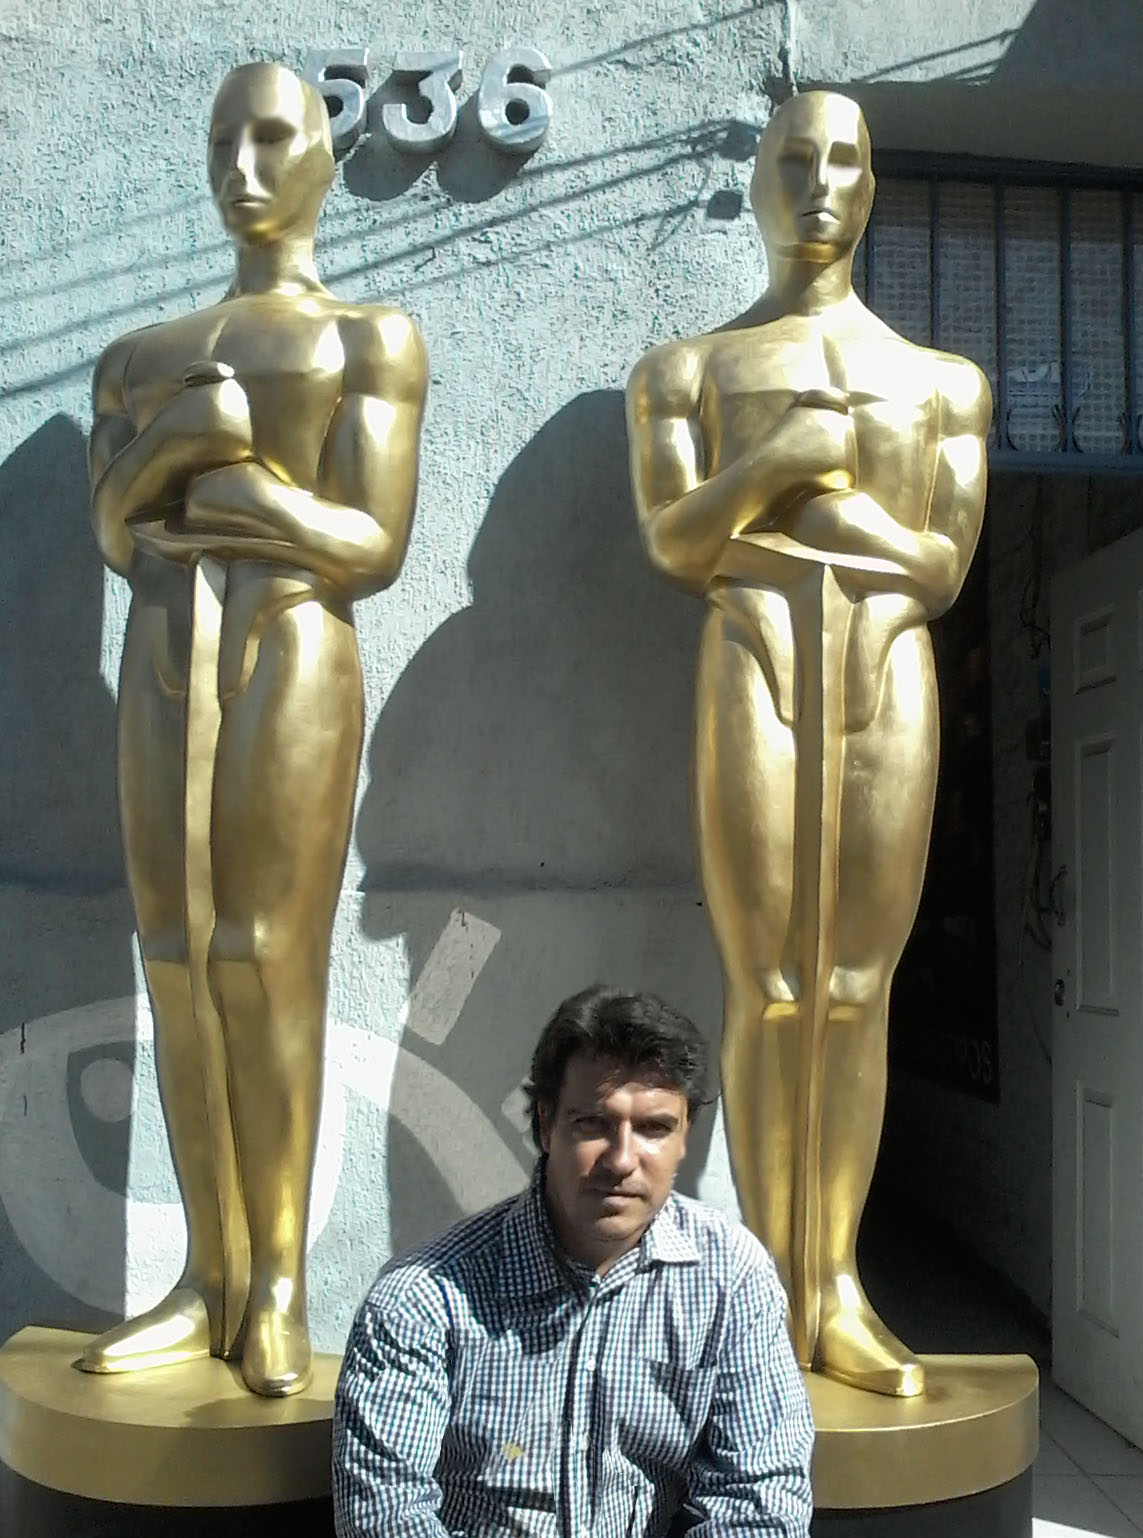 Oscar gigante.jpg